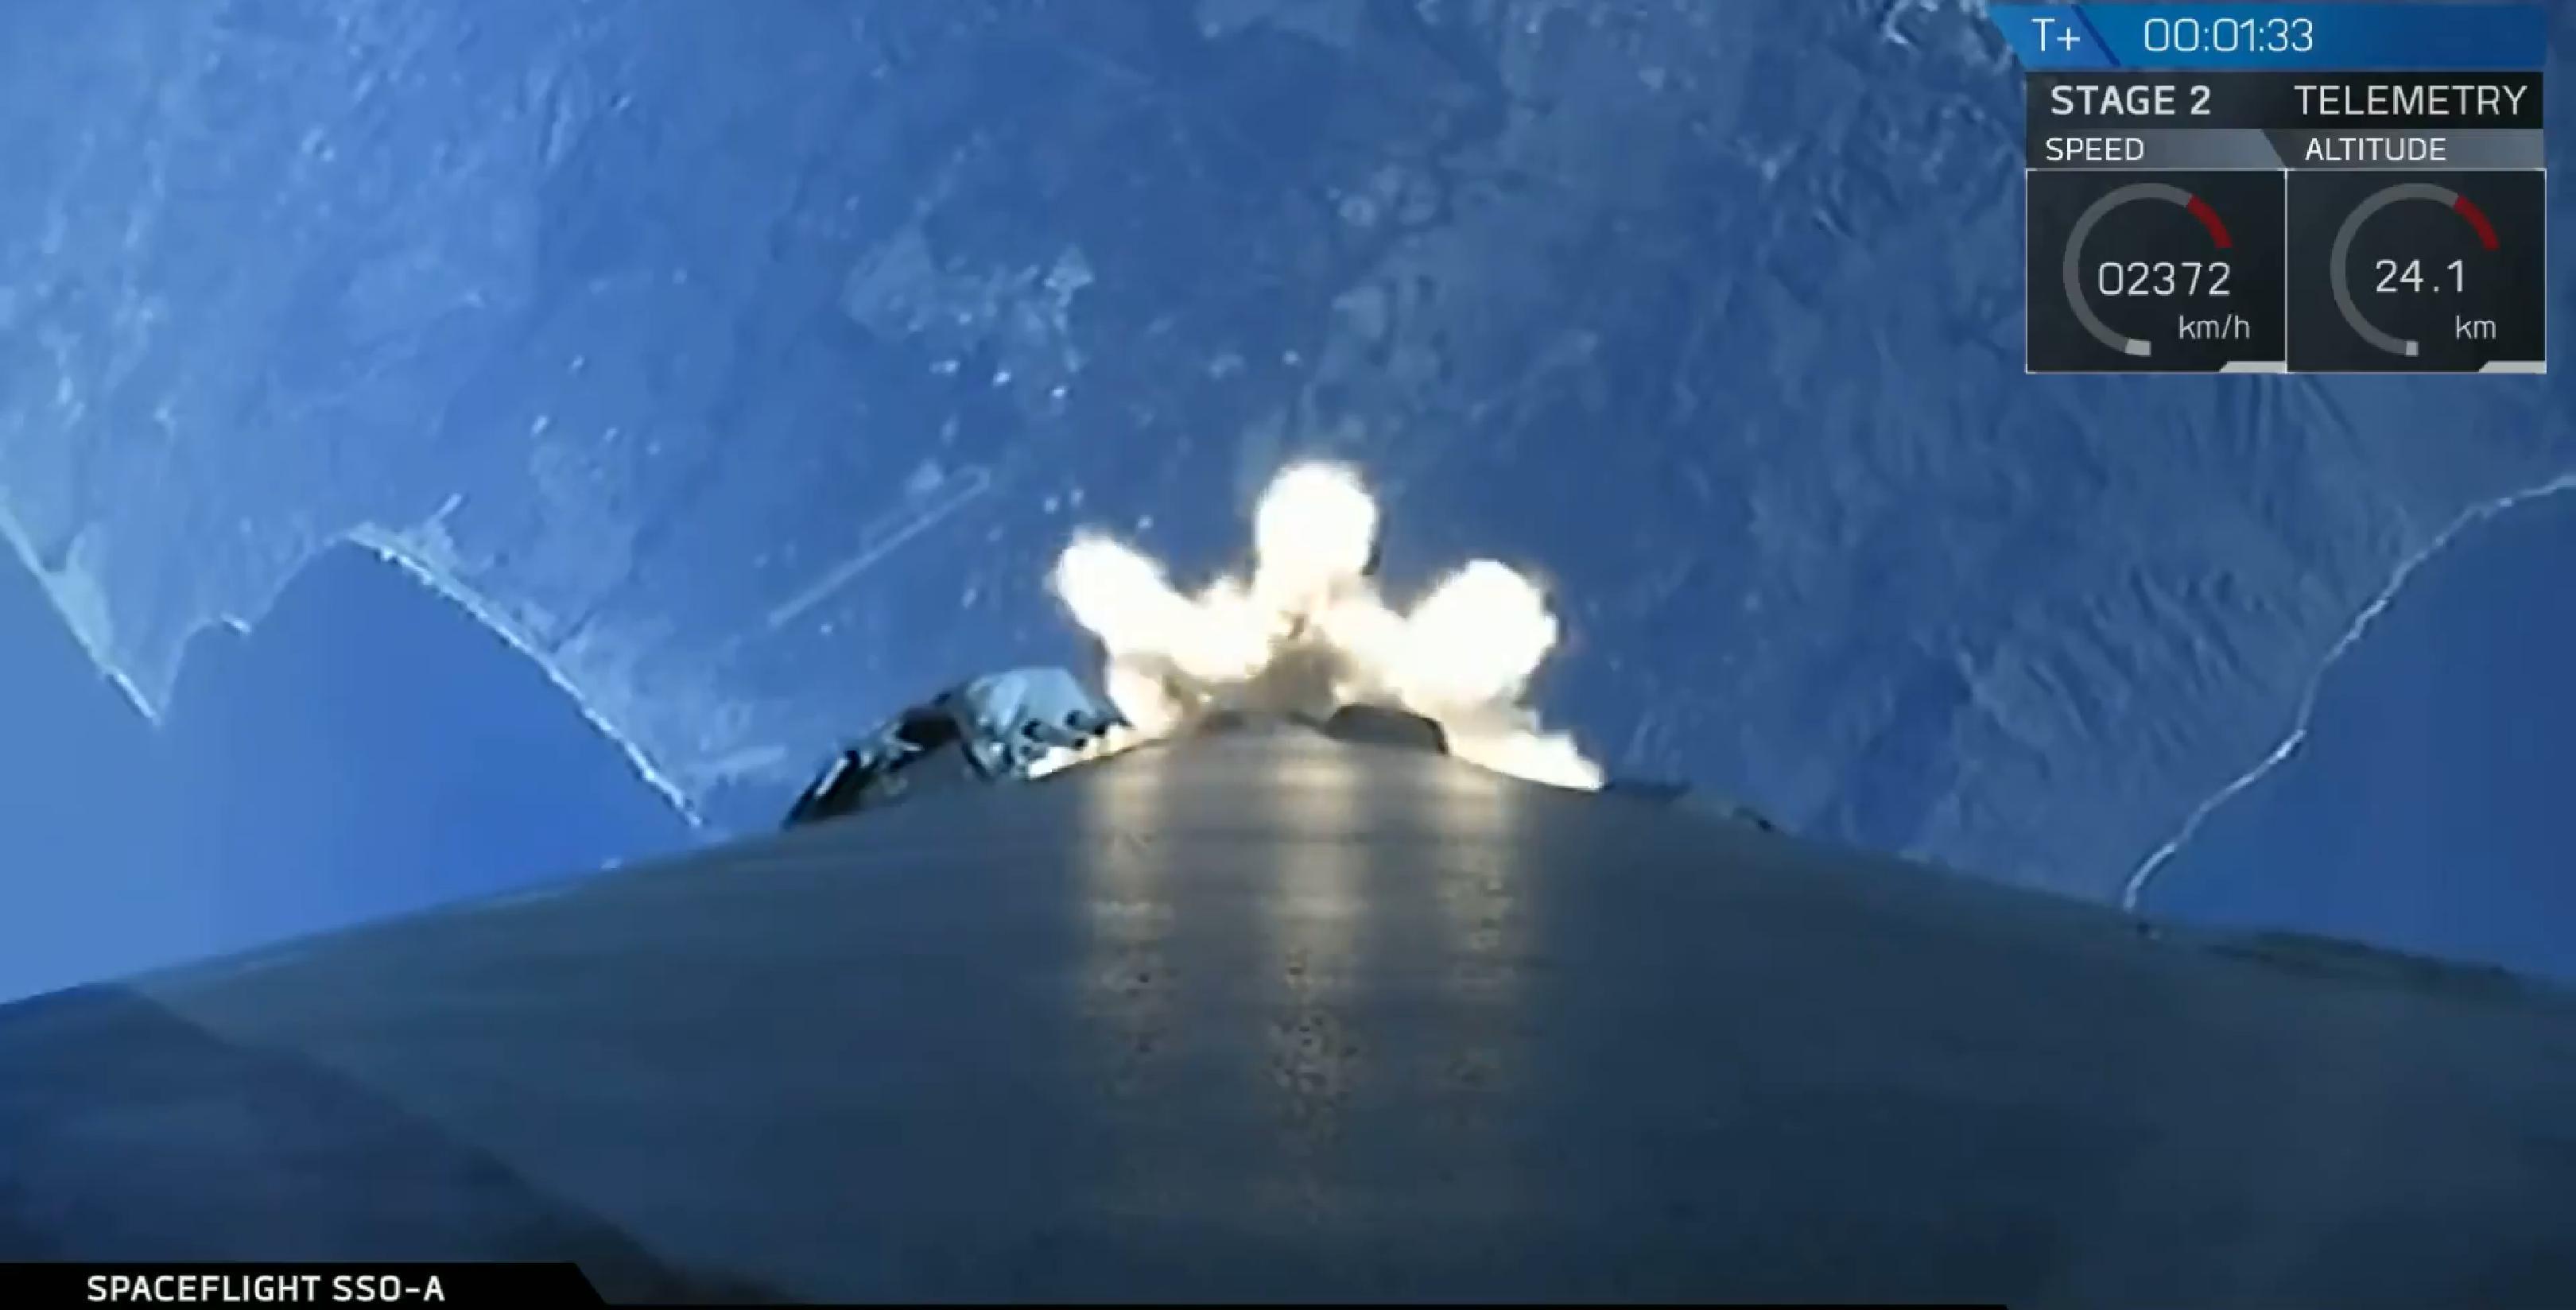 Falcon 9 B1046 SSO-A liftoff (SpaceX) 1